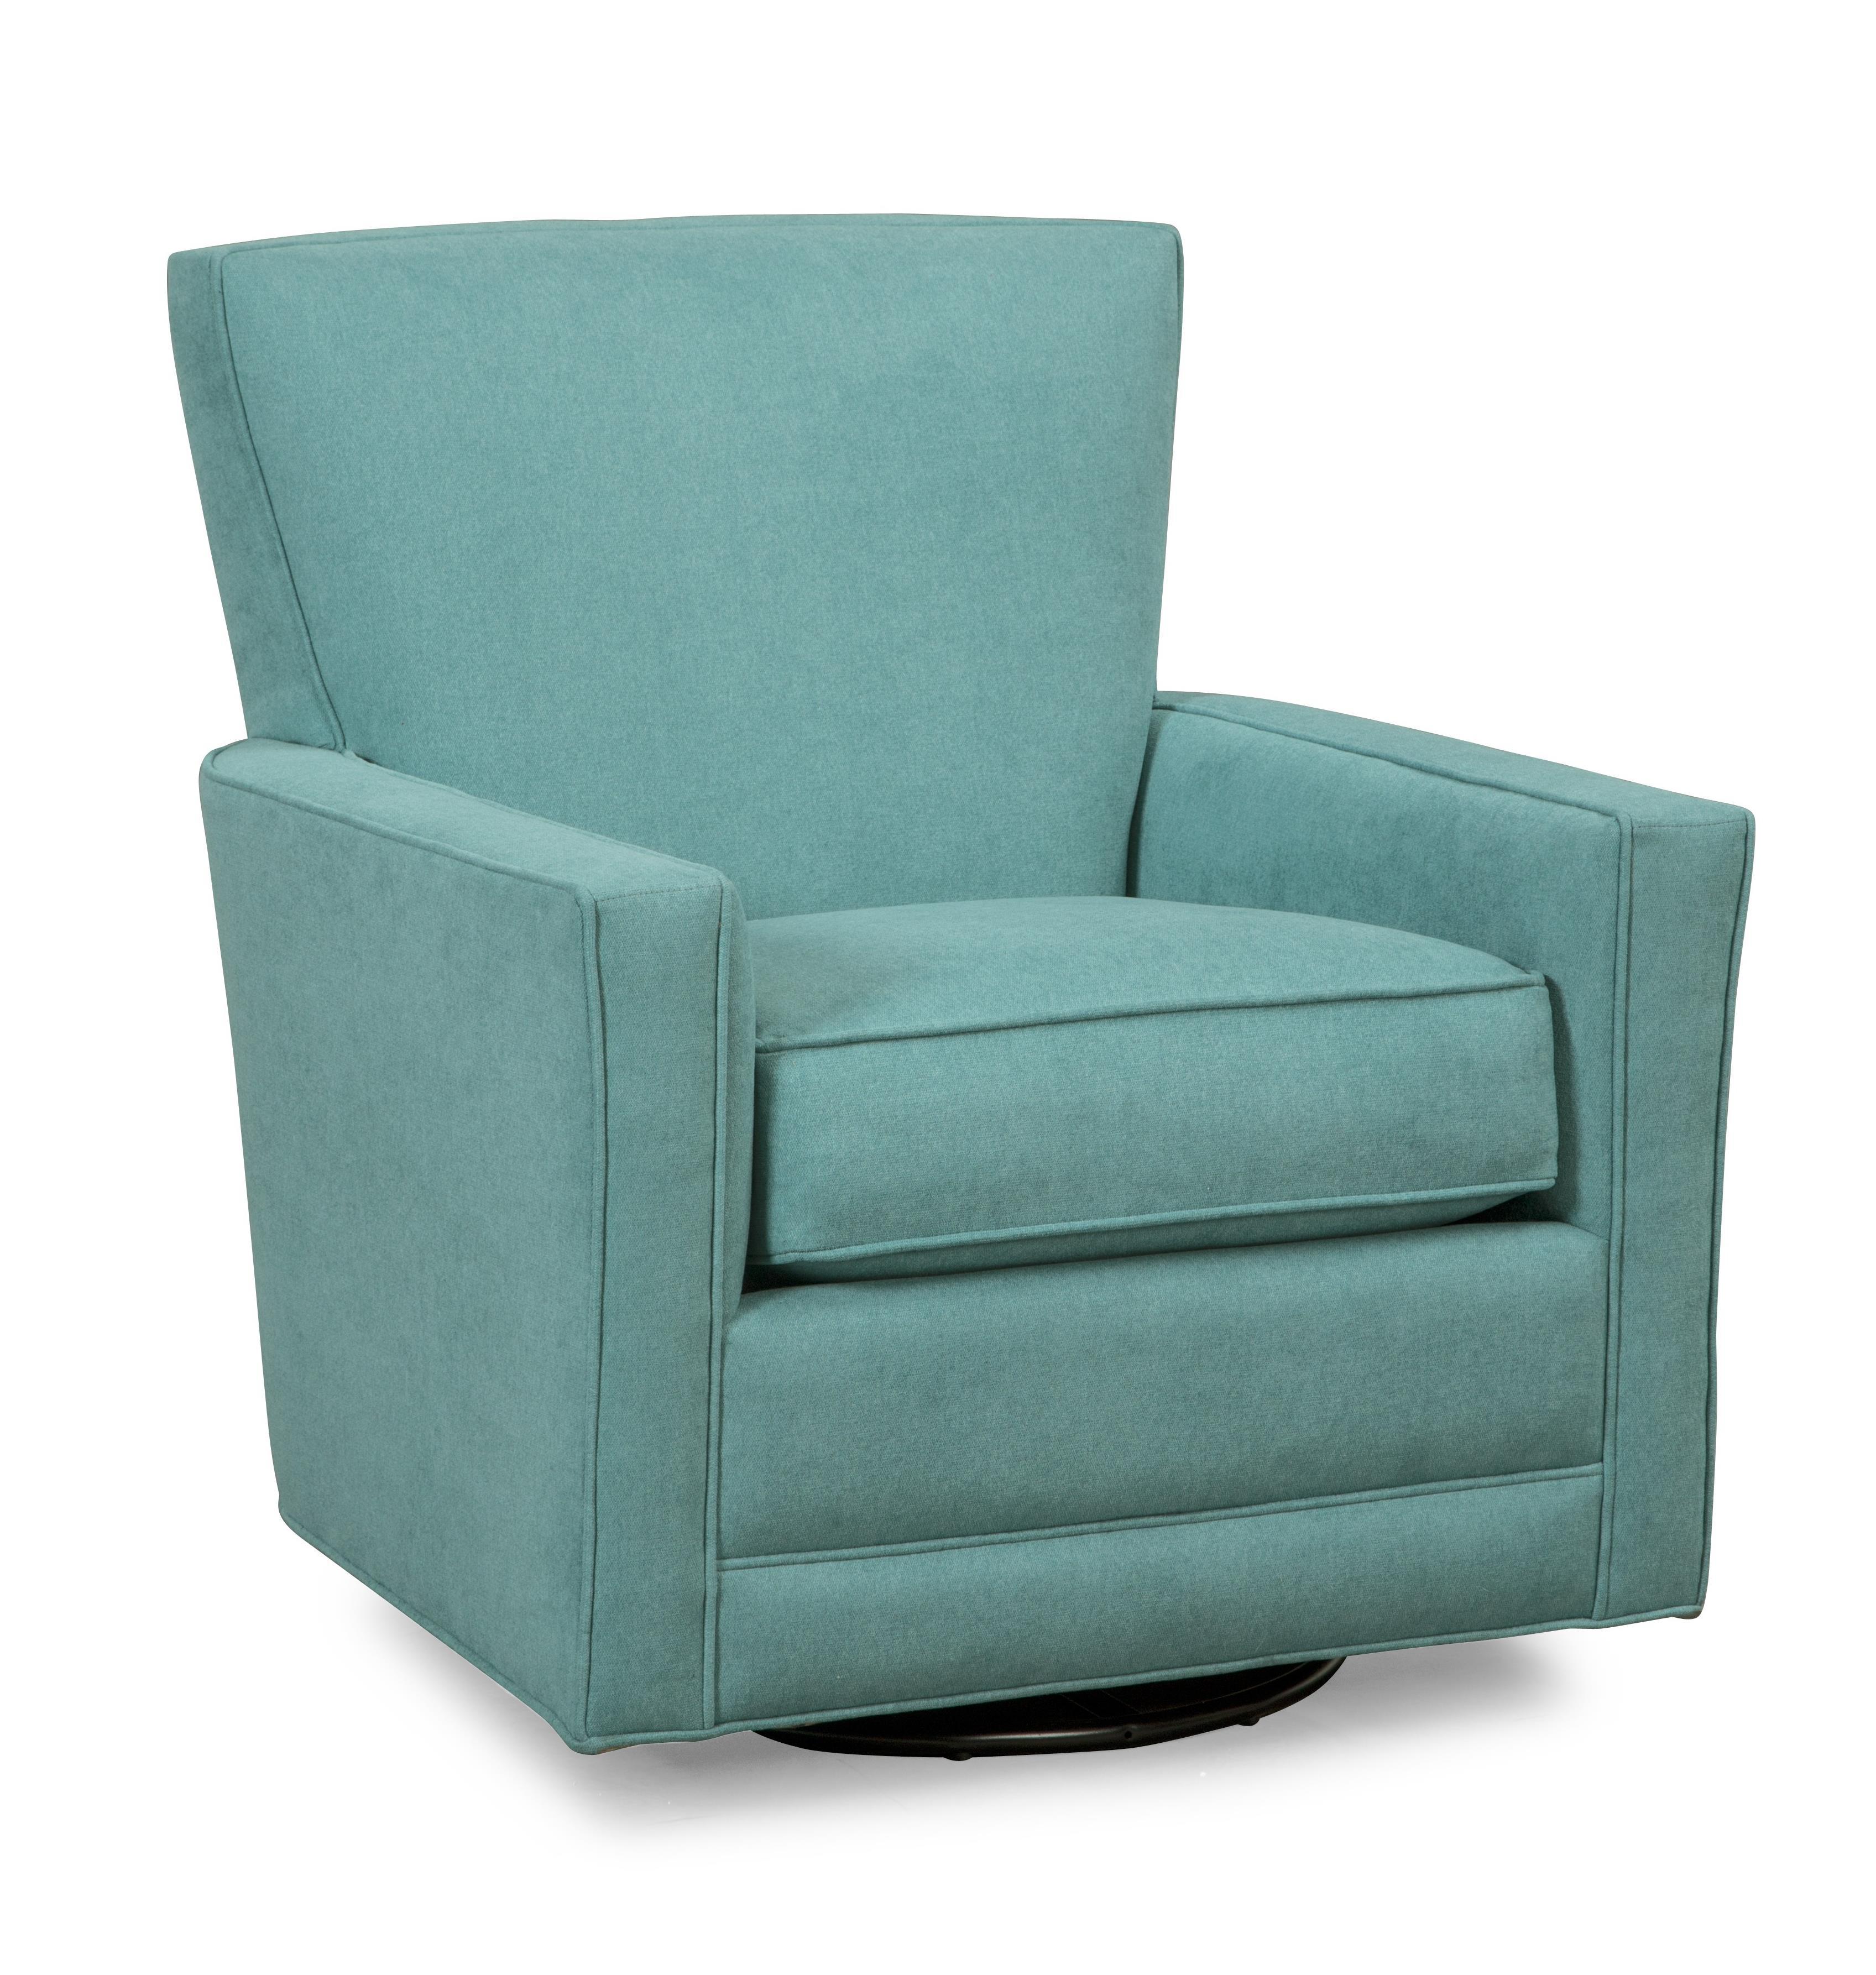 Craftmaster Swivel Chairs Swivel Glider Chair - Item Number: 055610SG-ABERDEEN-22